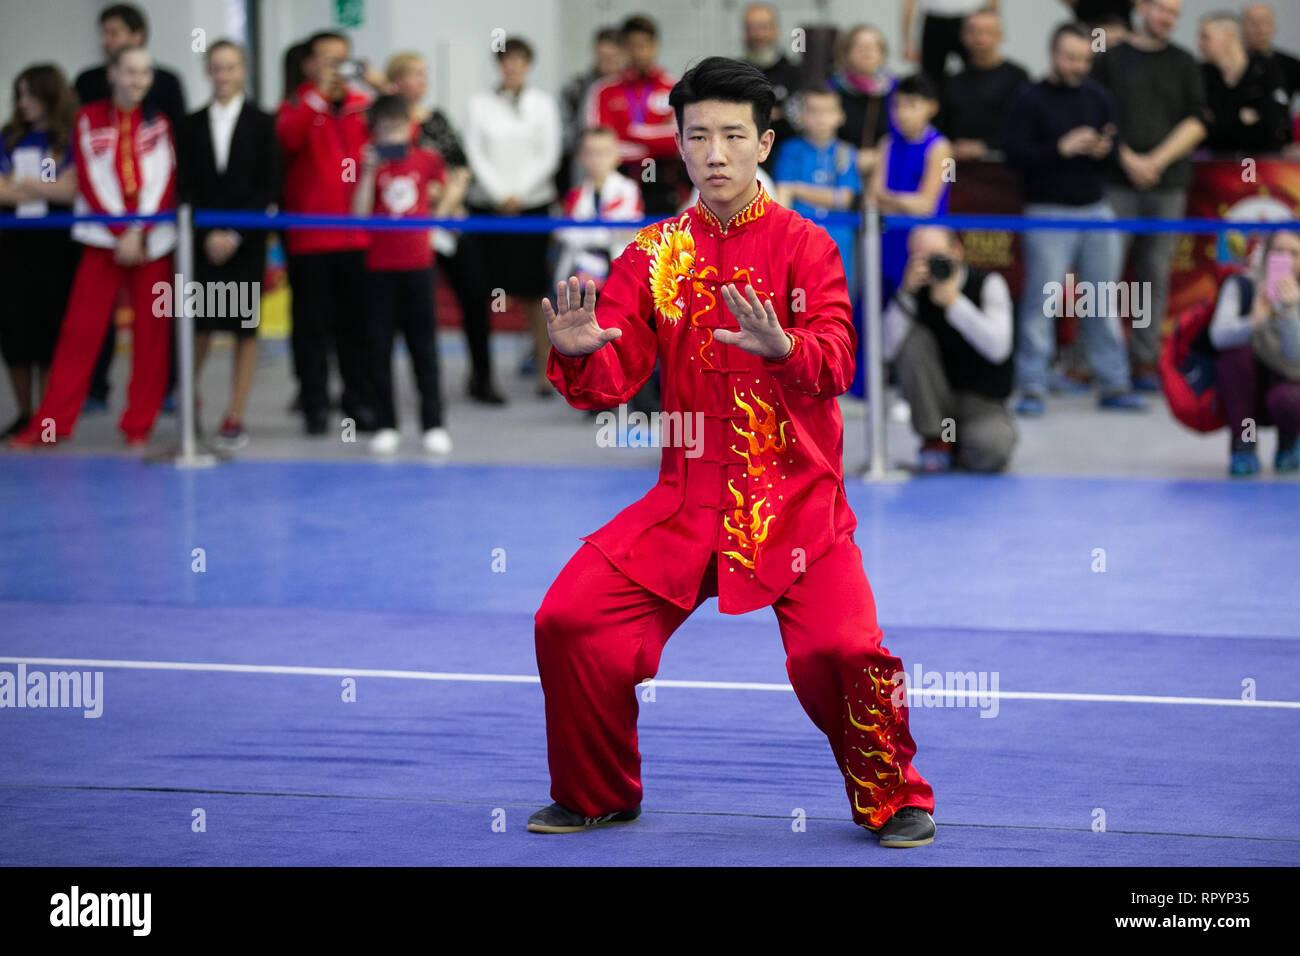 Moscú, Rusia. 23 Feb, 2019. Un competidor realiza durante la ceremonia de apertura de la Moscú Wushu Stars 2019 competencia en Moscú, Rusia, el 23 de febrero, 2019. Crédito: Bai Xueqi/Xinhua/Alamy Live News Foto de stock